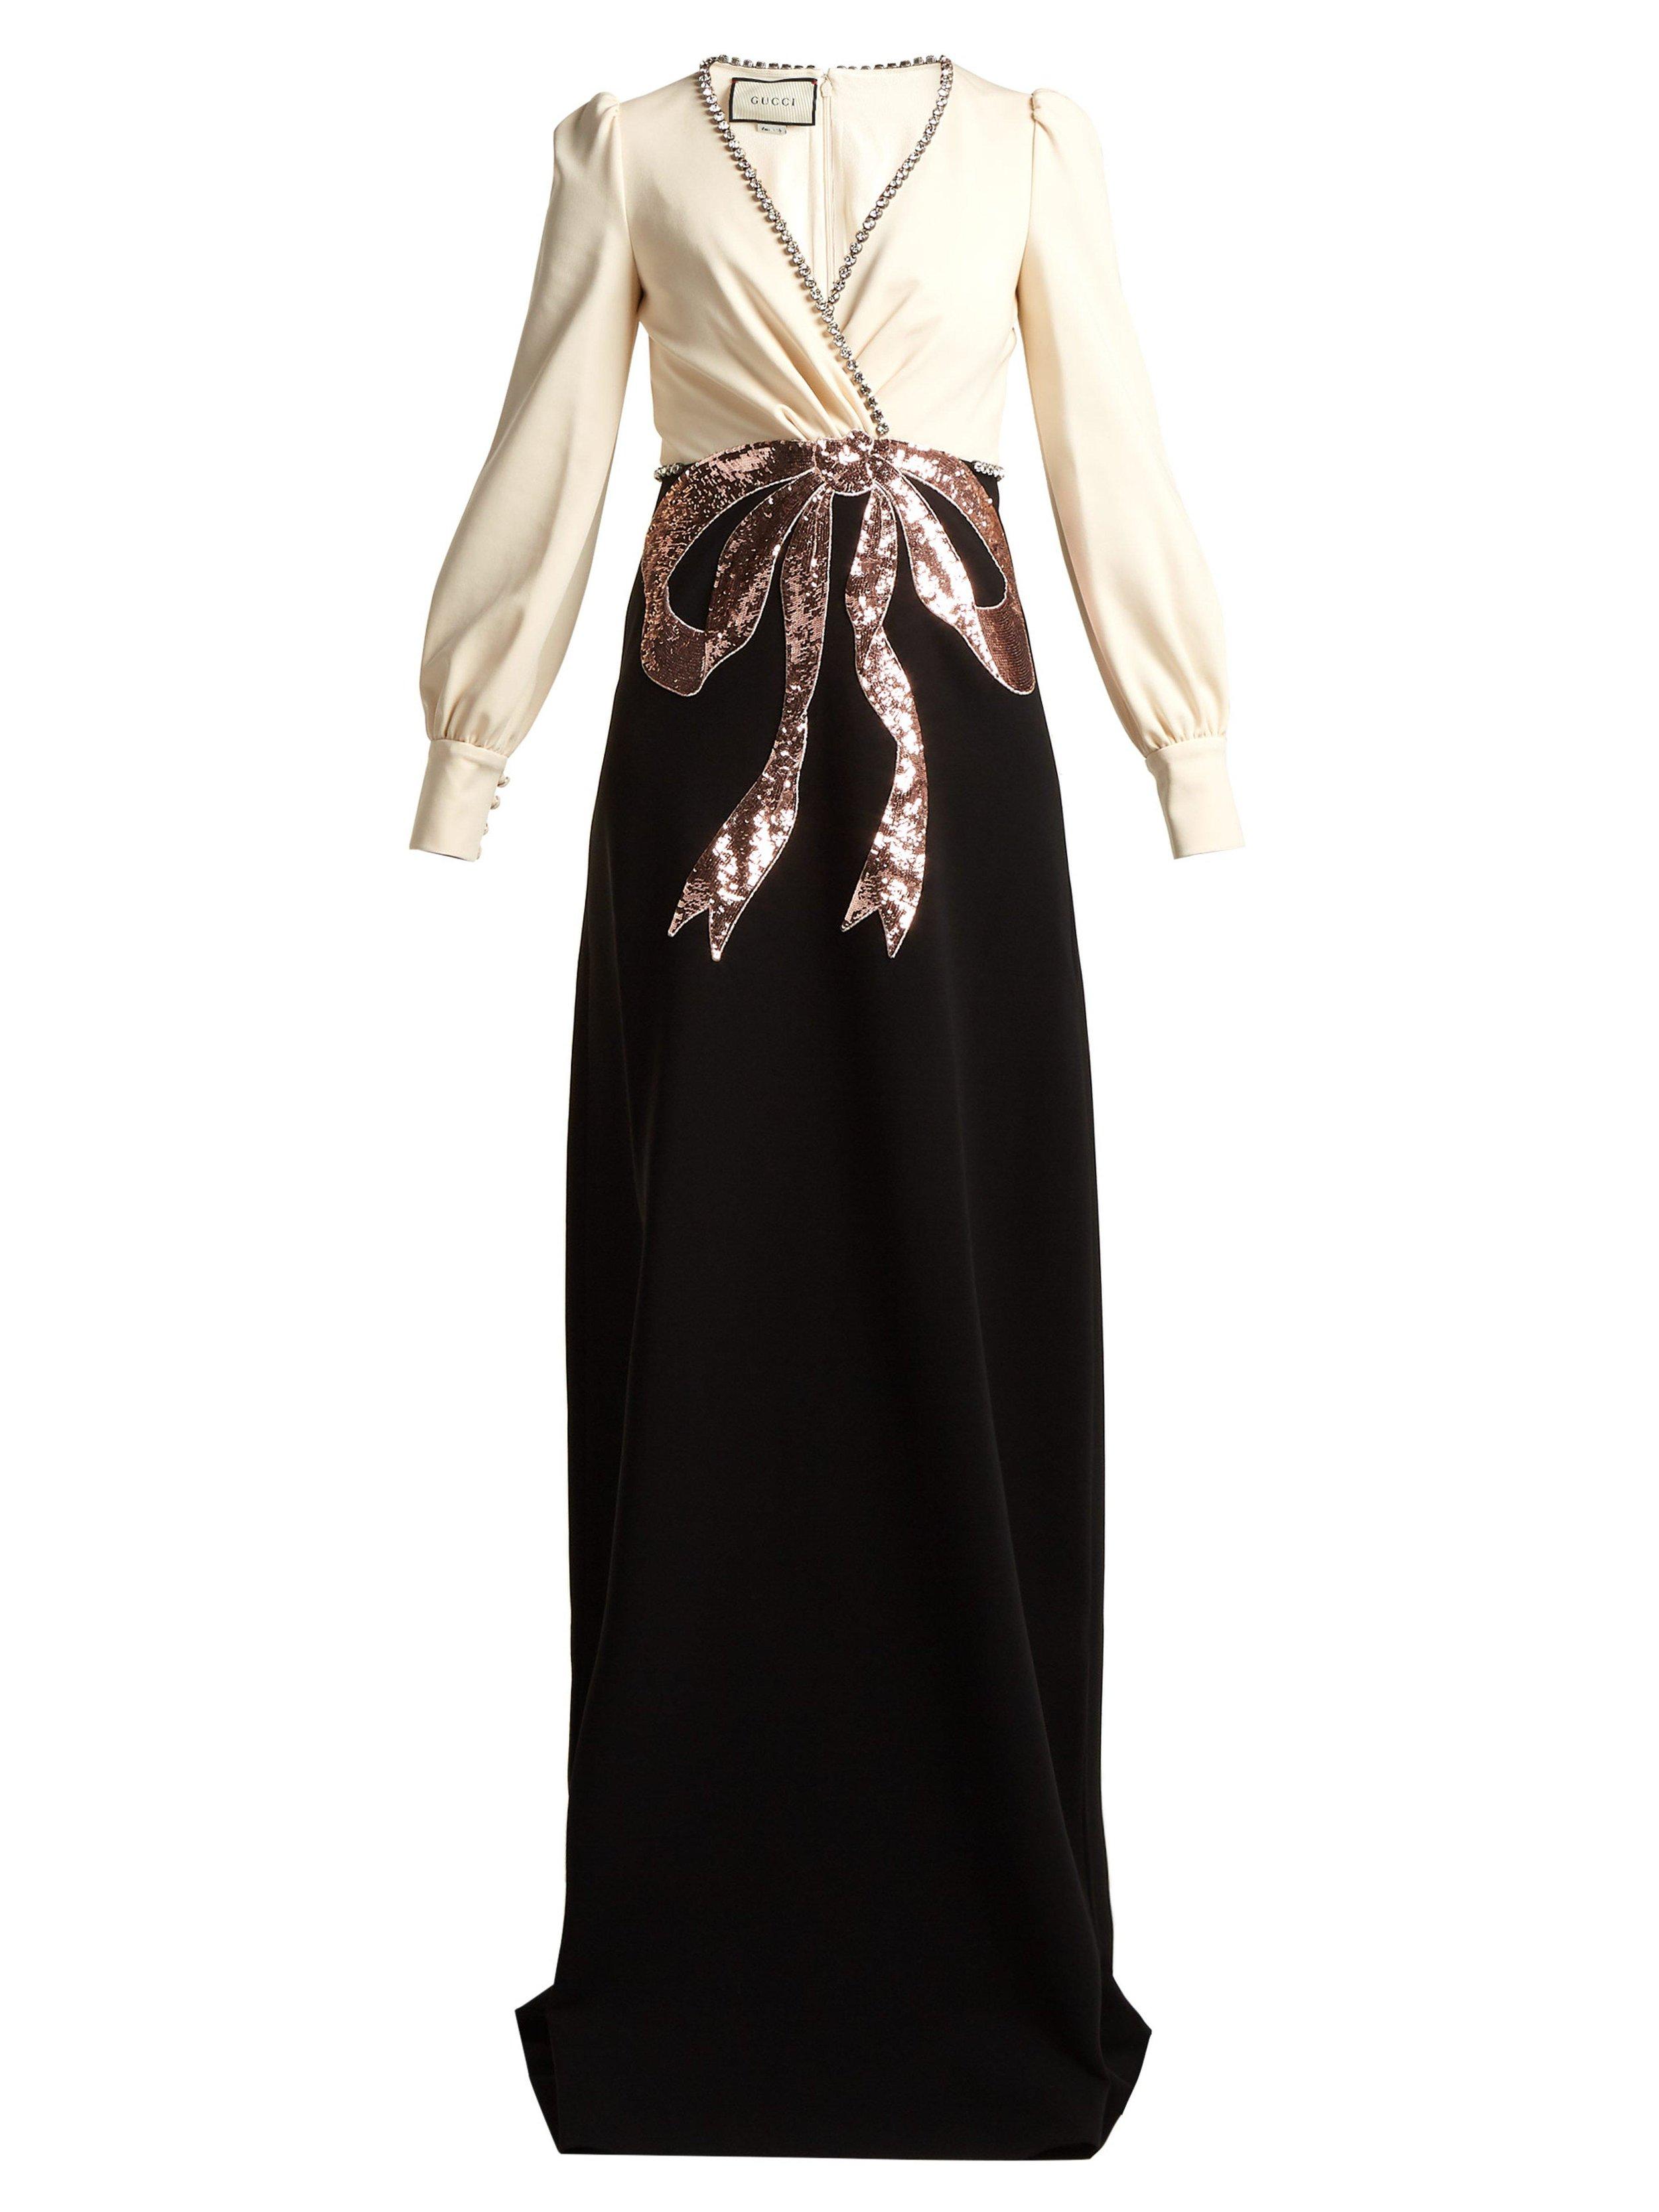 Gucci Crystal Sequin-Embellished Crepe Gown.jpg